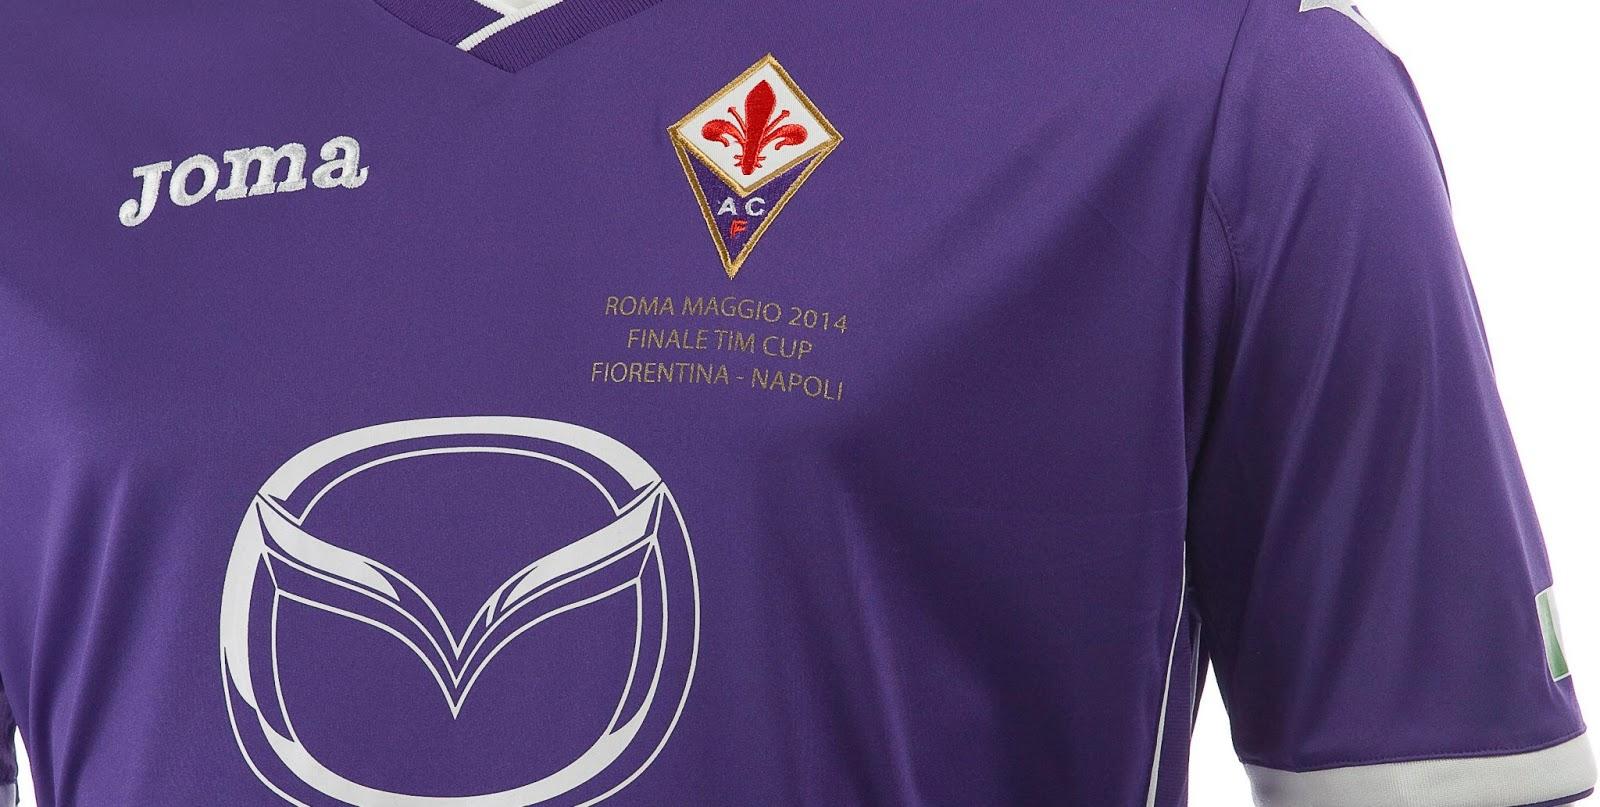 SC Fiorentina 2014 Coppa Italia Final Kit (5)